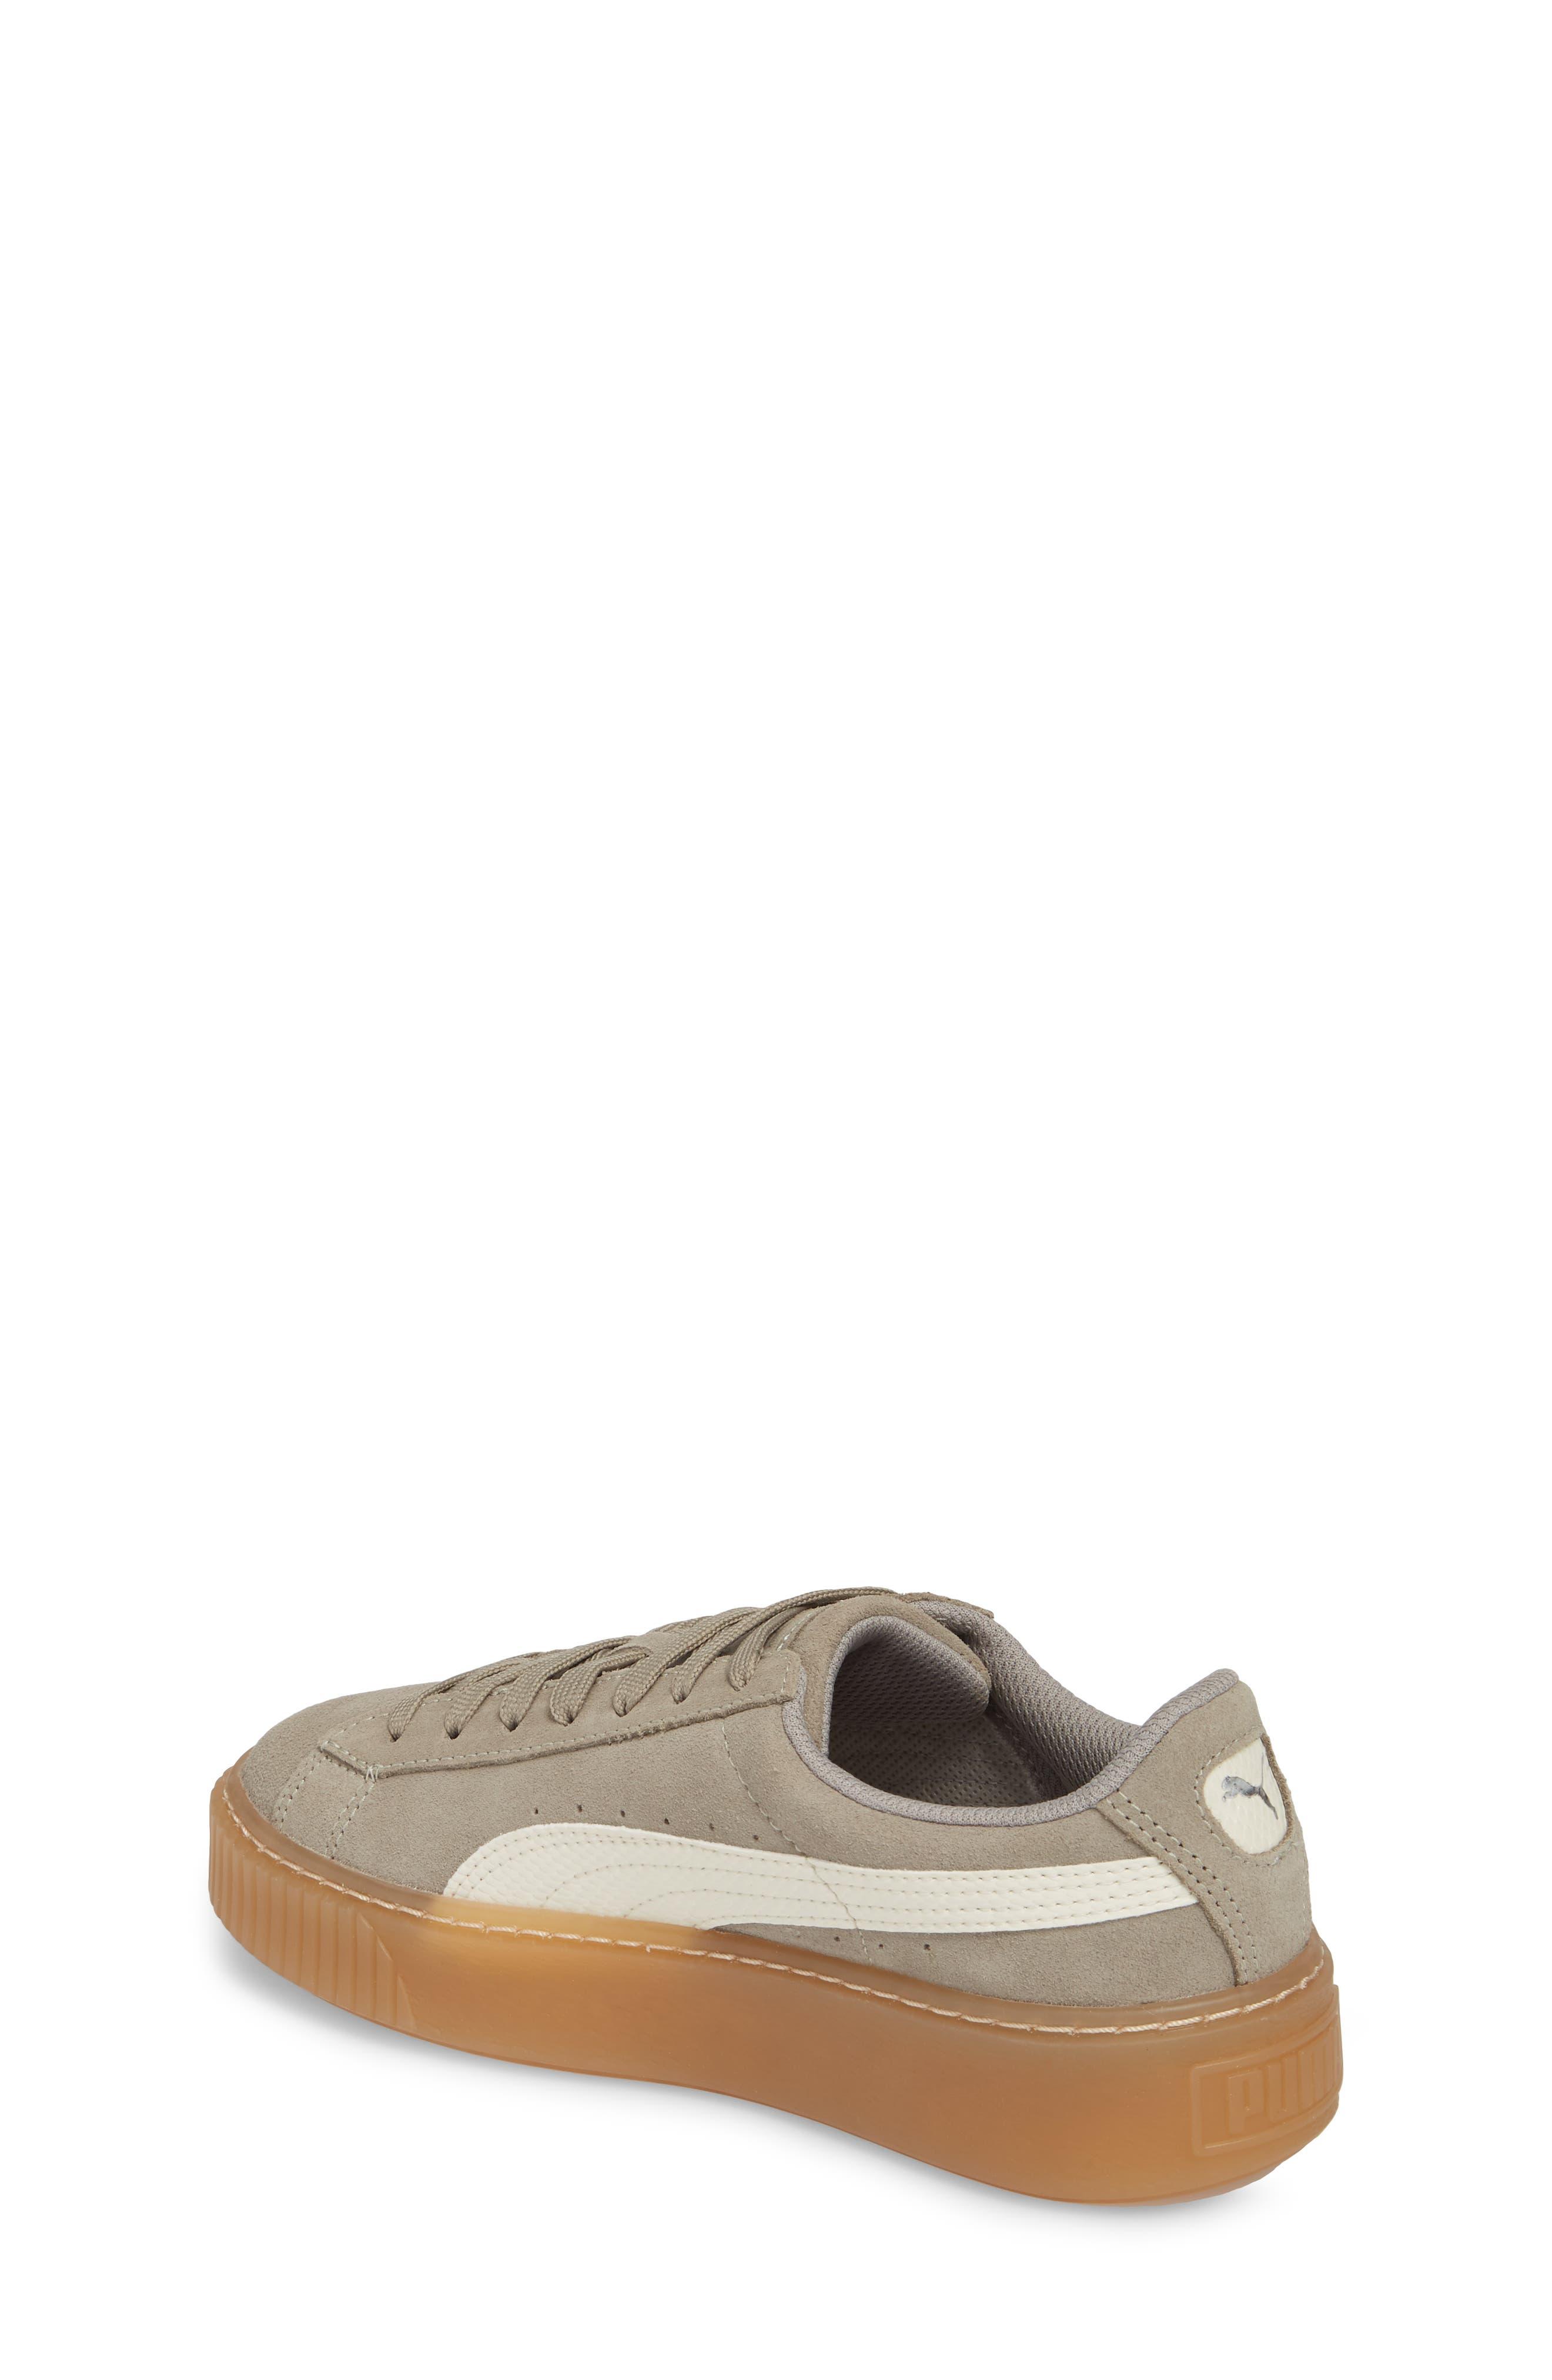 Suede Platform Jr Sneaker,                             Alternate thumbnail 2, color,                             060